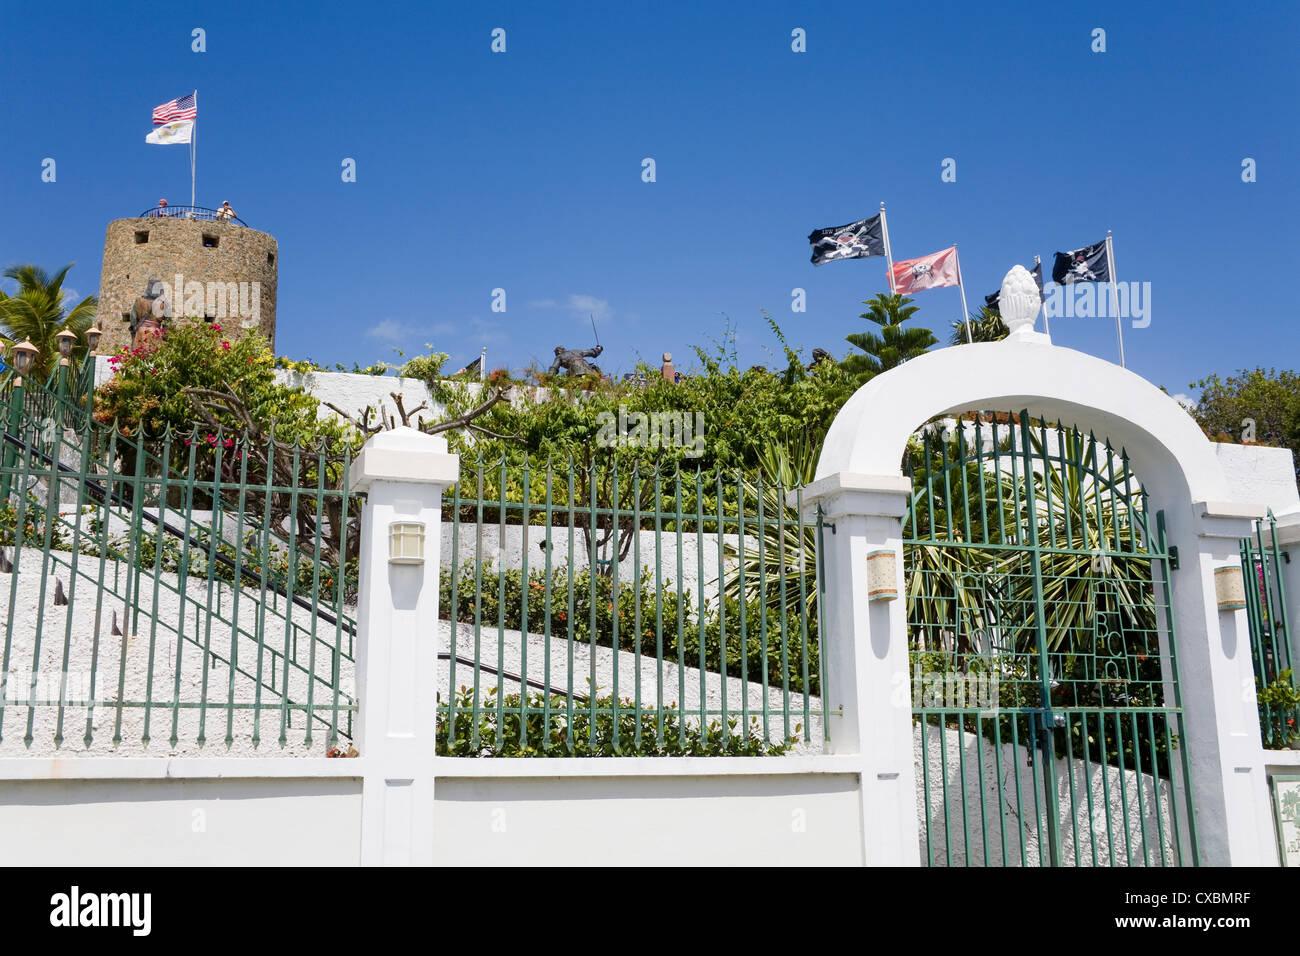 Blackbeard's Castle in Kongens Quarter, Charlotte Amalie, St. Thomas Island, U.S. Virgin Islands, West Indies - Stock Image